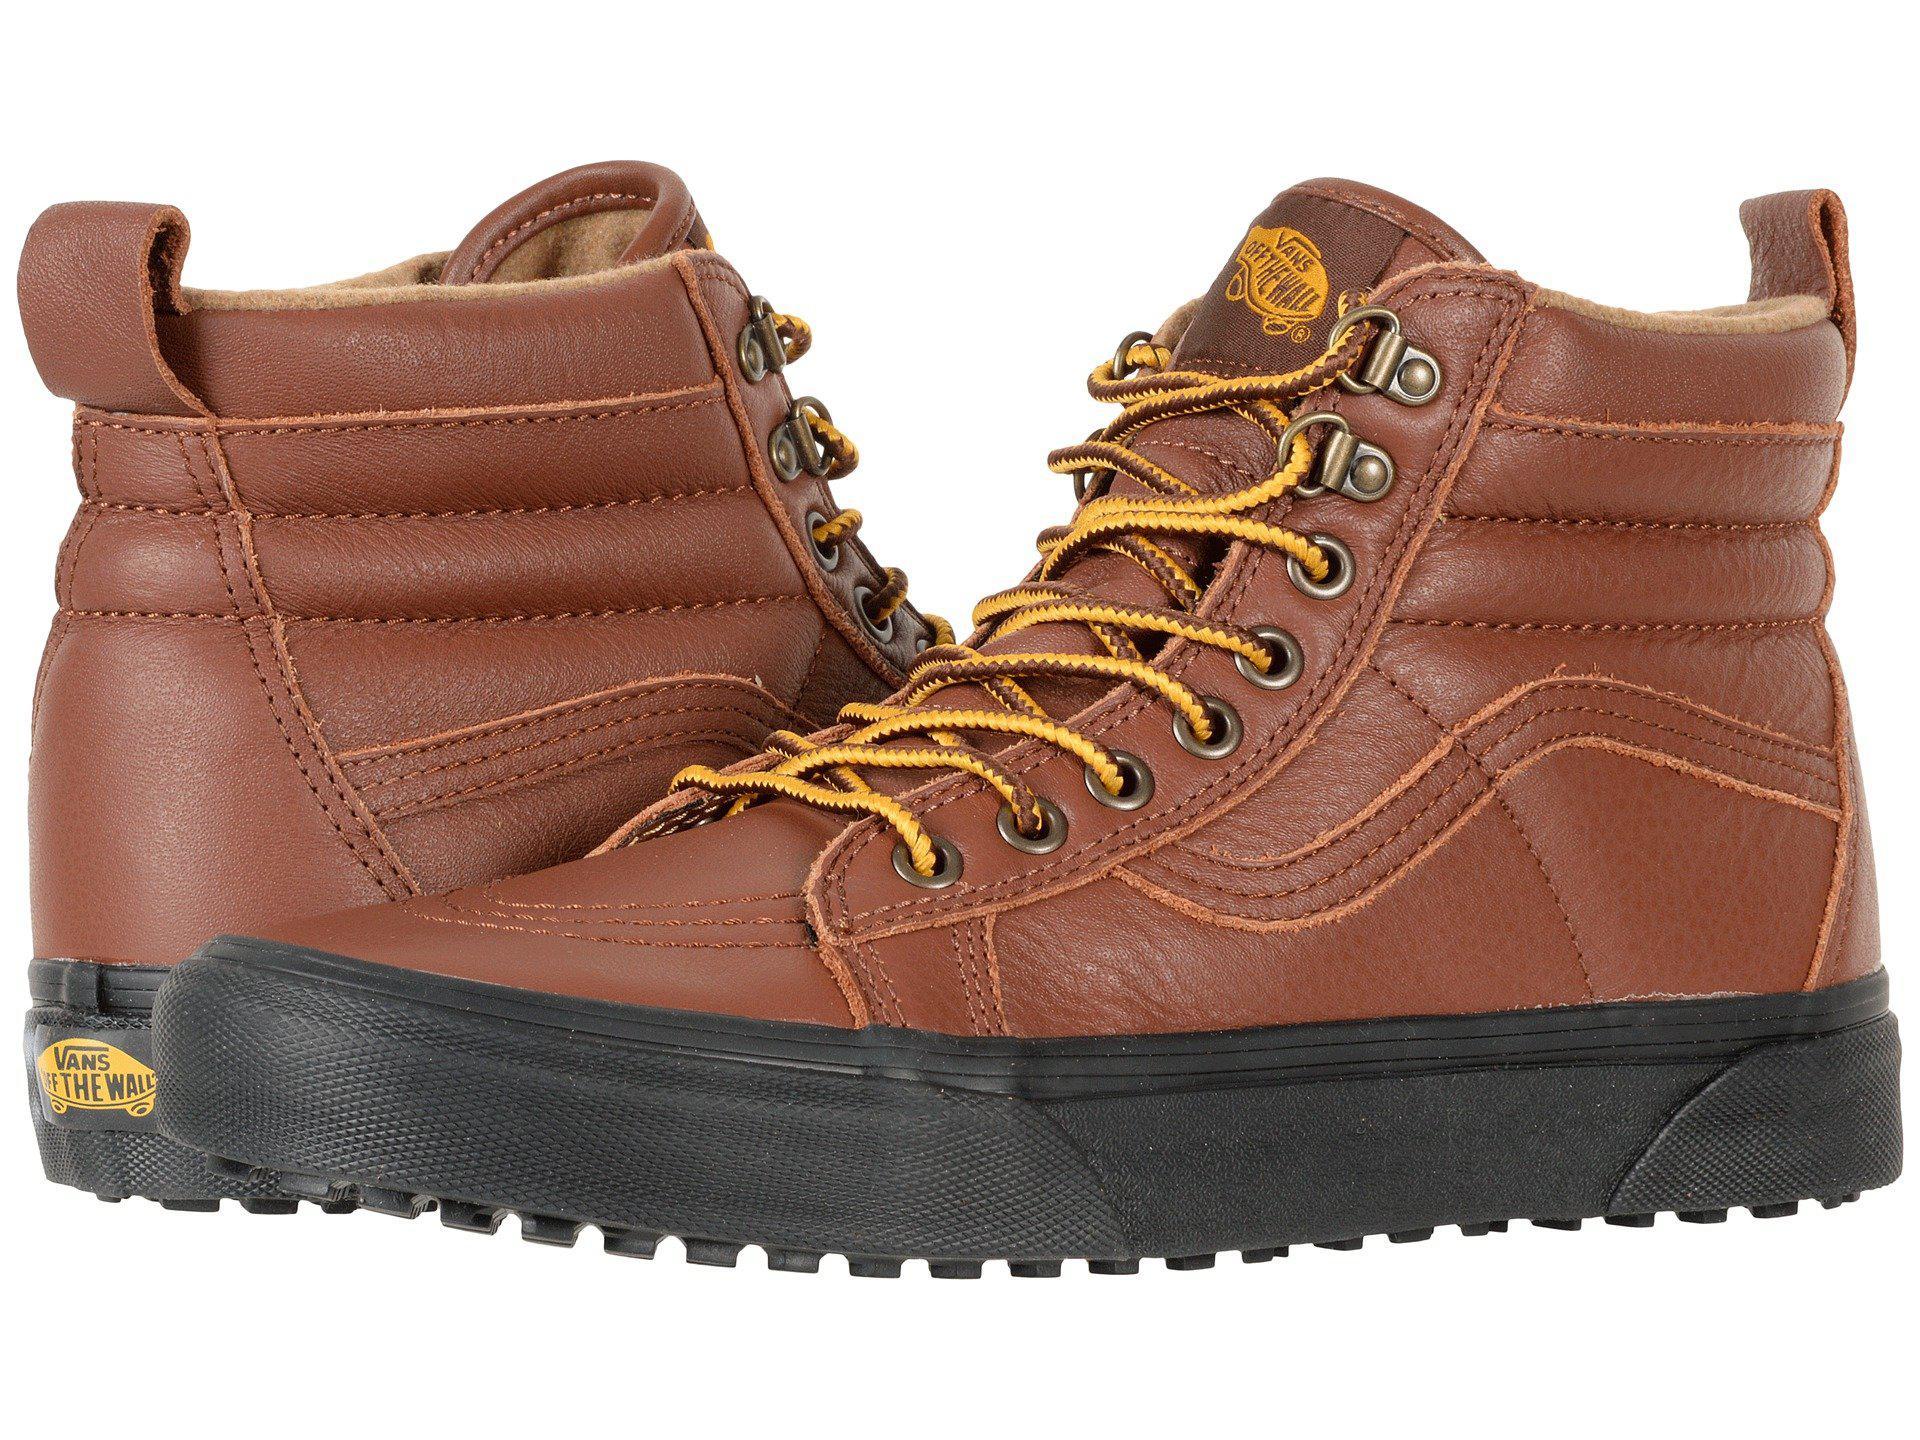 kody promocyjne niska cena Darmowa dostawa Sk8-hi Mte ((mte) Winter Moss/military) Skate Shoes